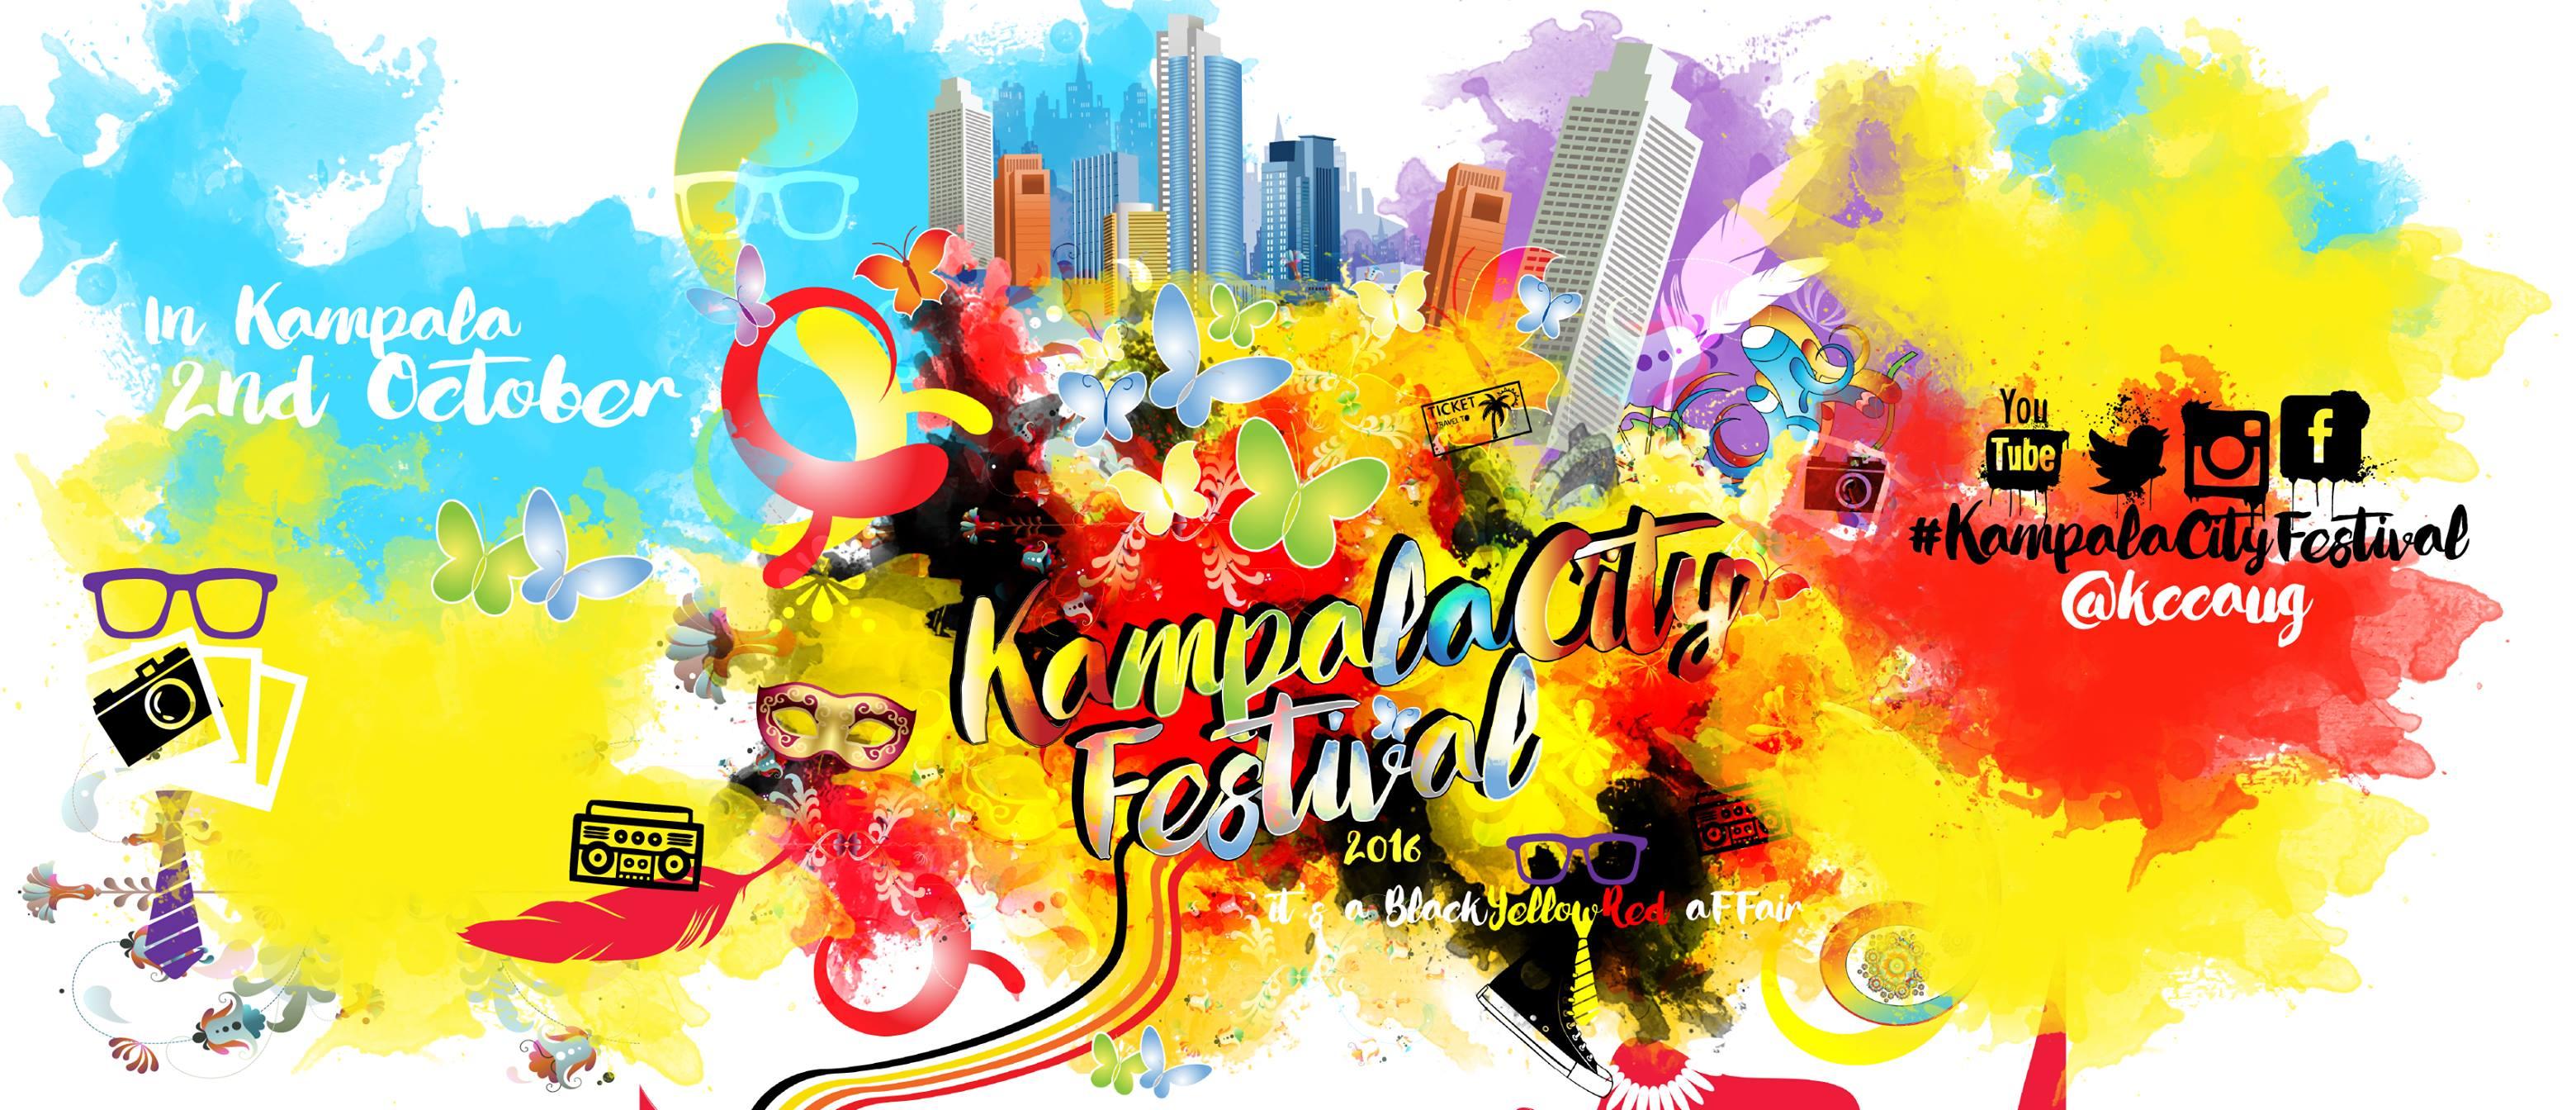 city-festival-13